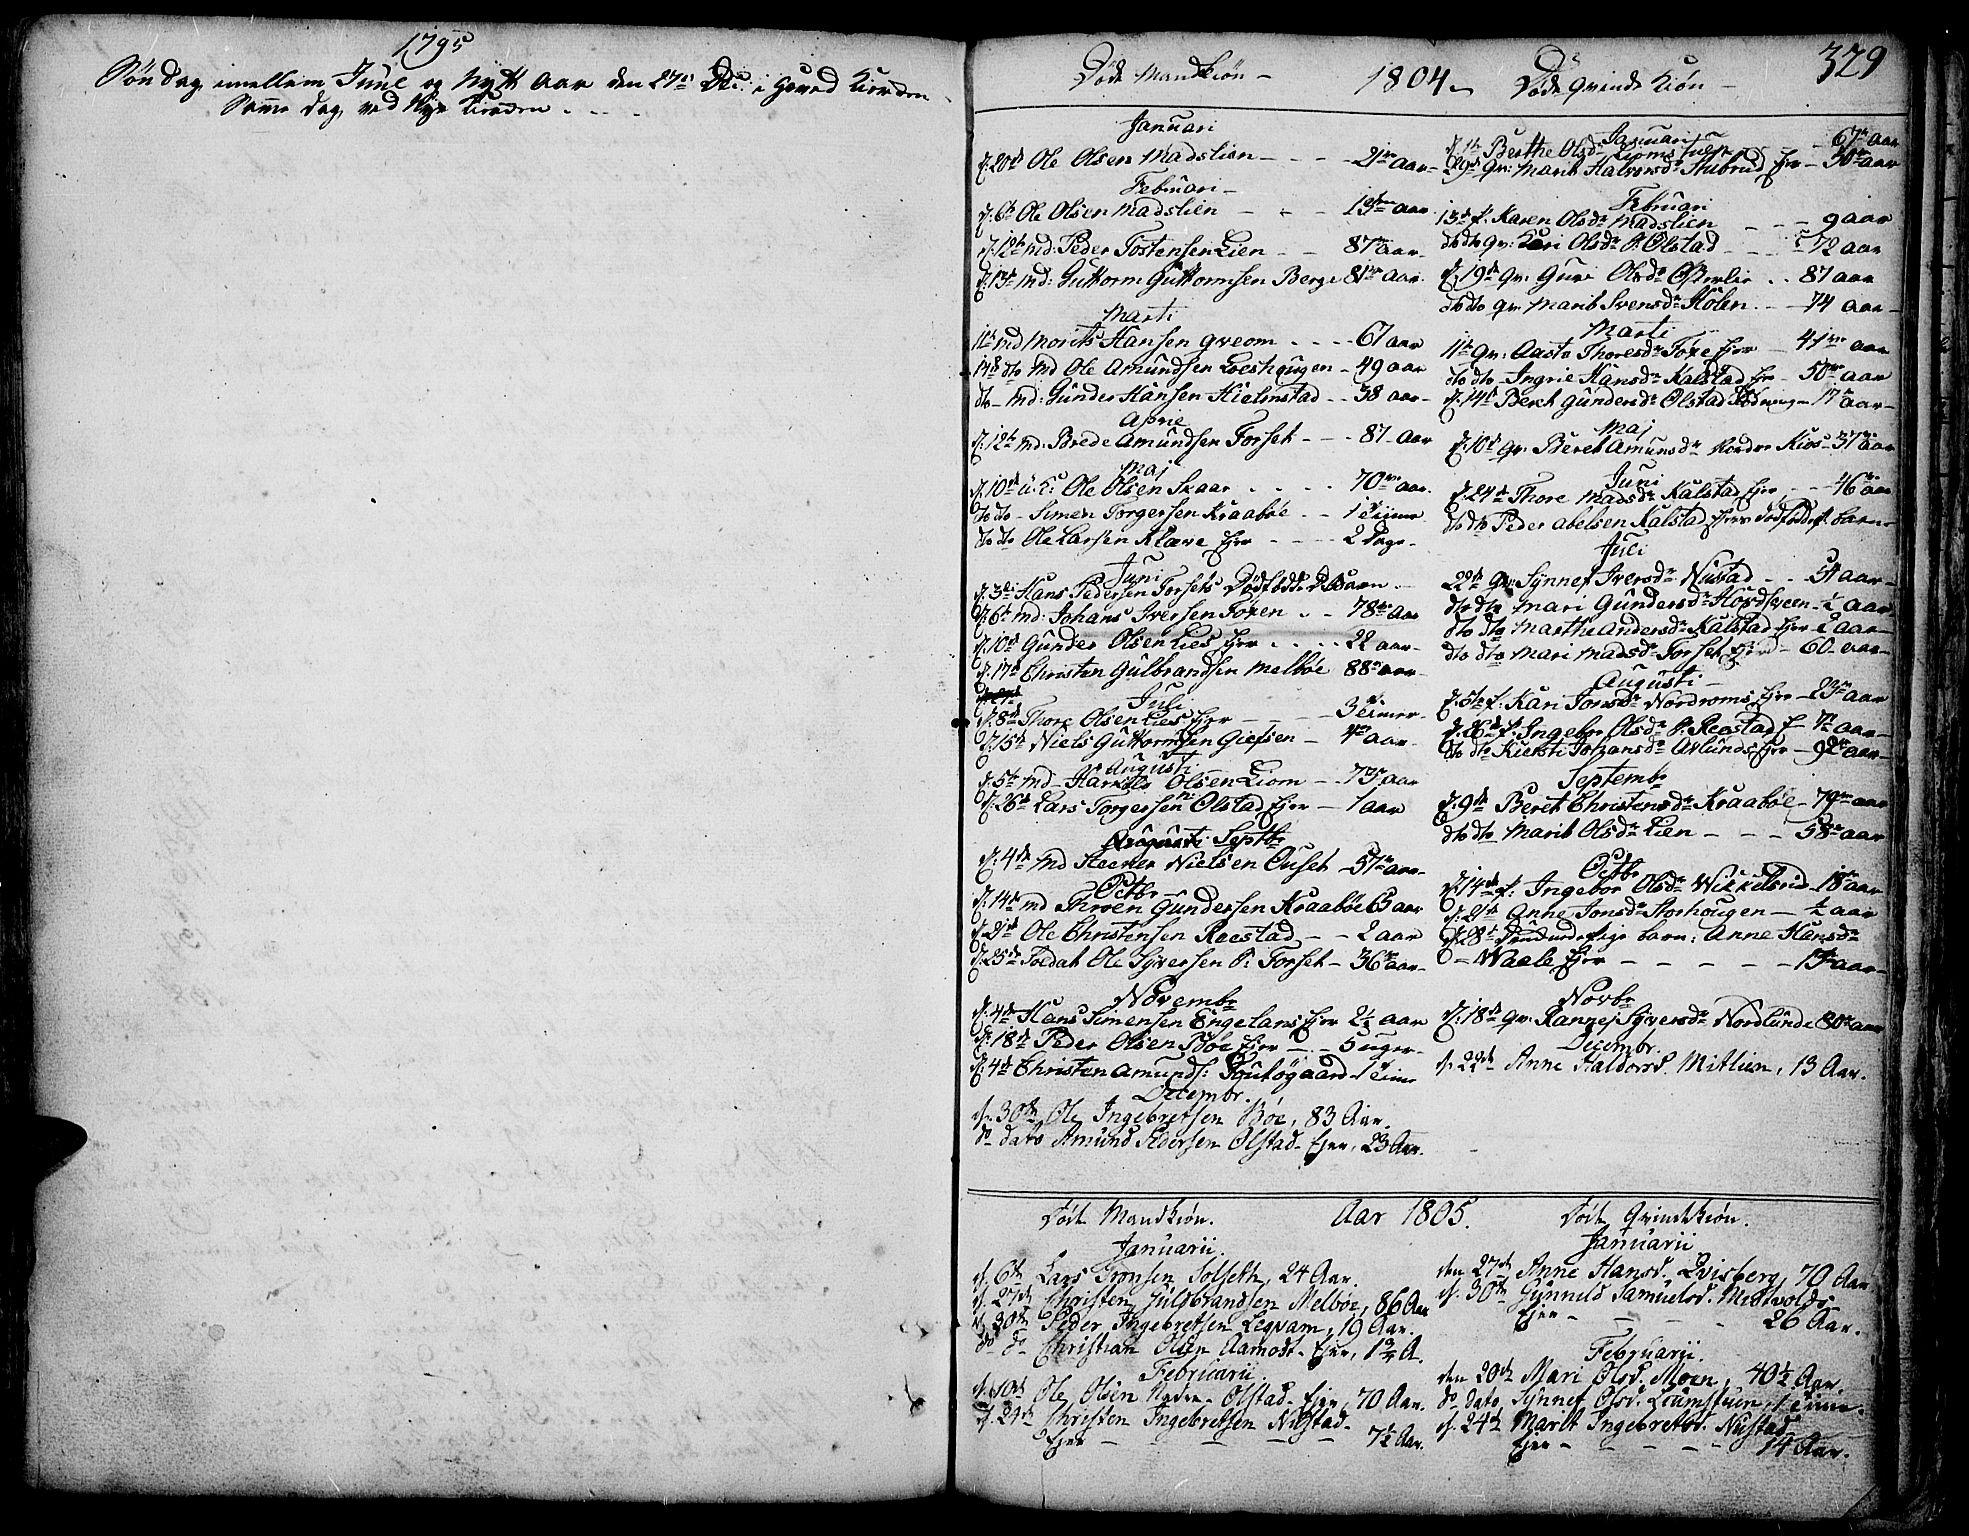 SAH, Gausdal prestekontor, Ministerialbok nr. 3, 1758-1809, s. 329